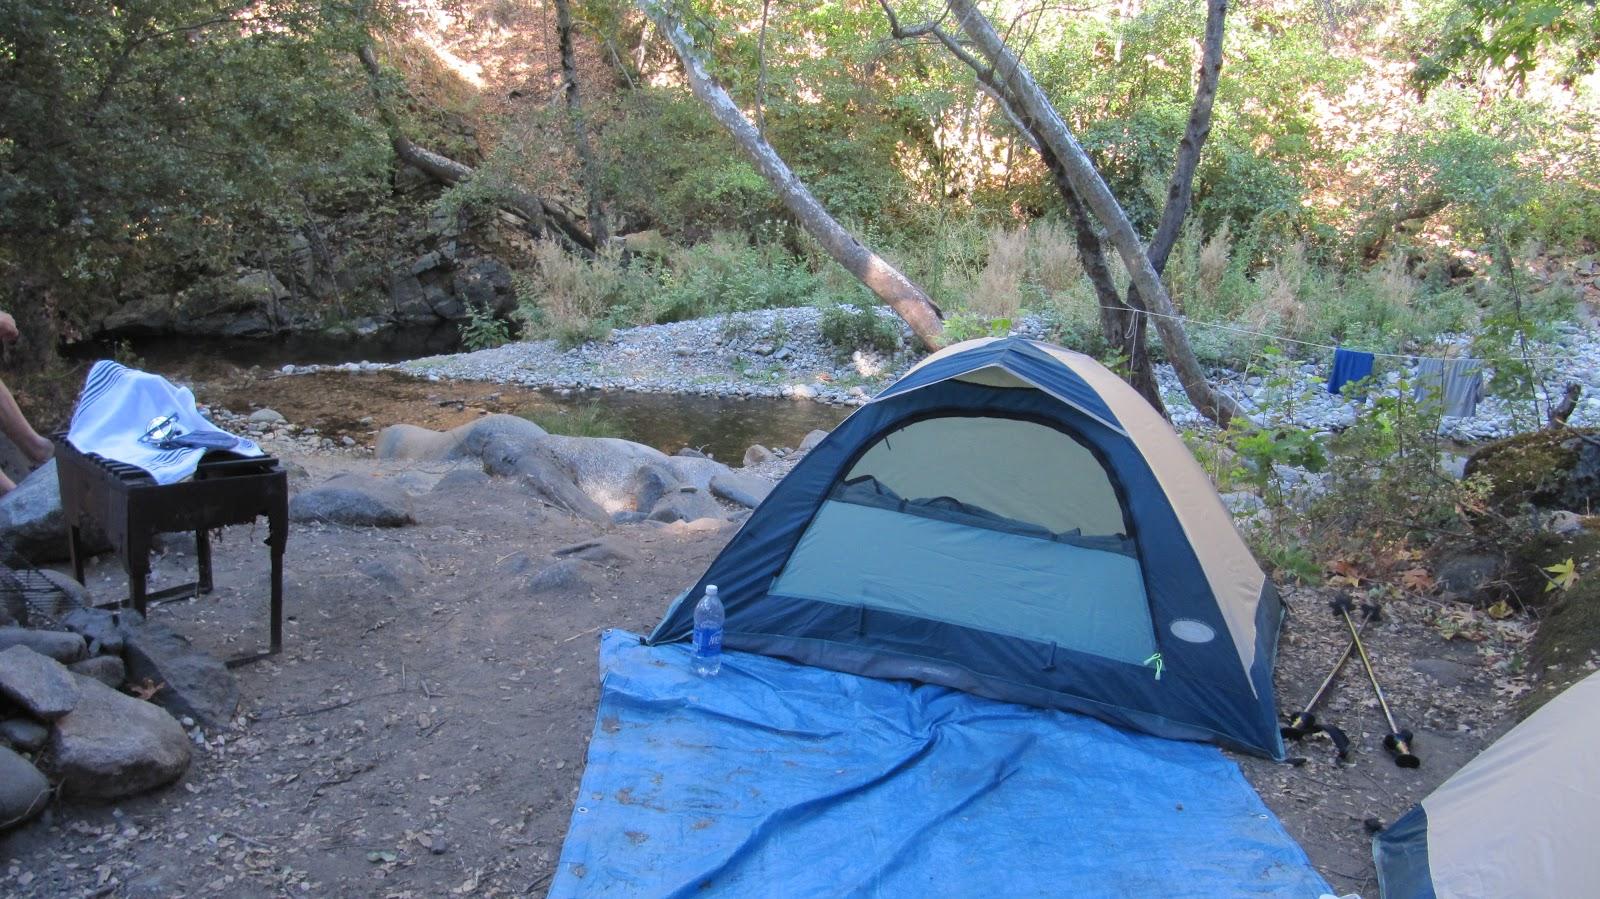 ashley's adventure blog: los padres dam to carmel river camp